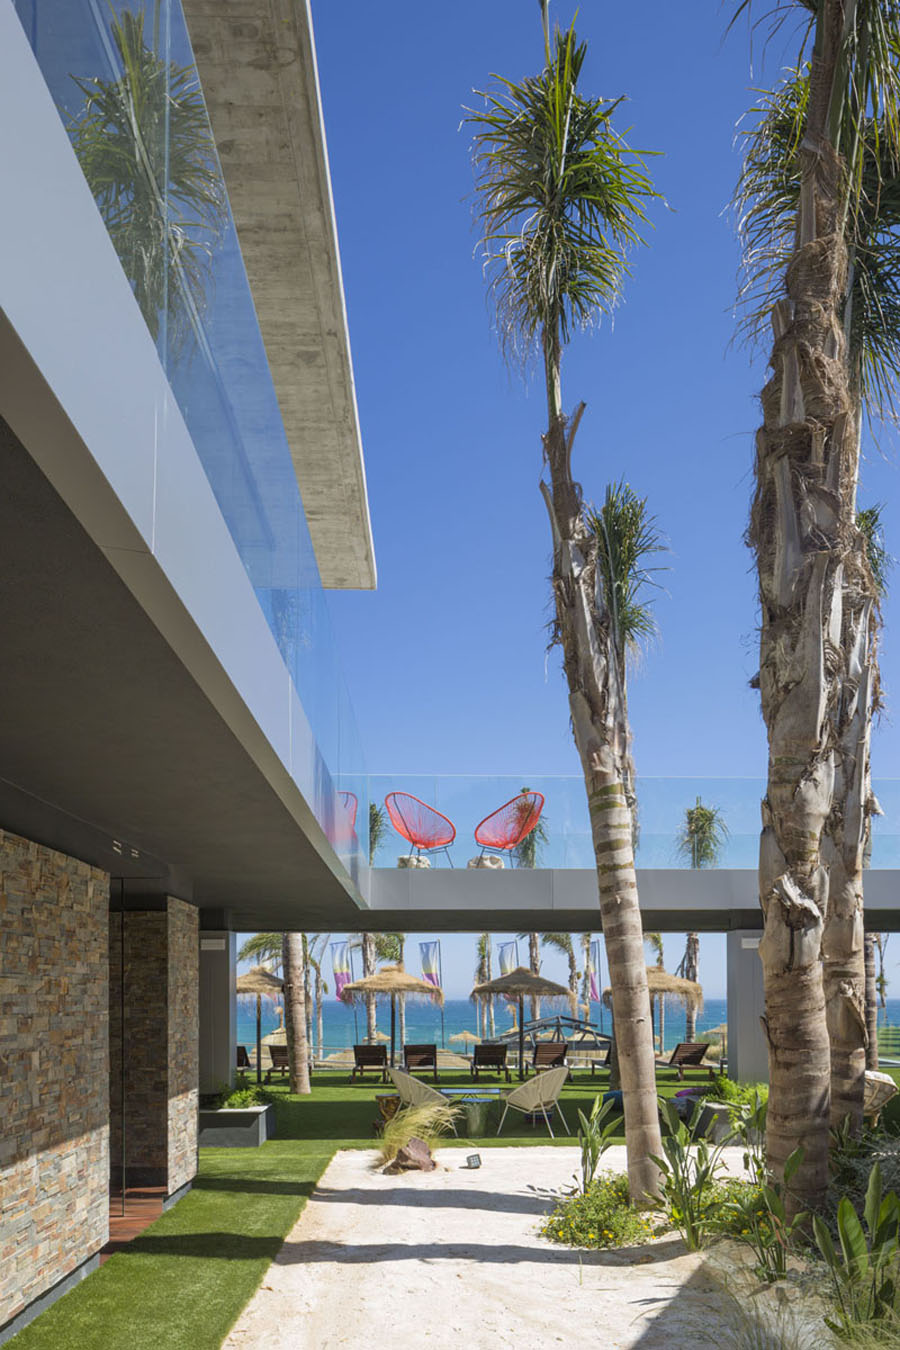 spanish-beach-apartment-property-for-sale-marbella-mijas-costa-del-sol-estate-agents-spain